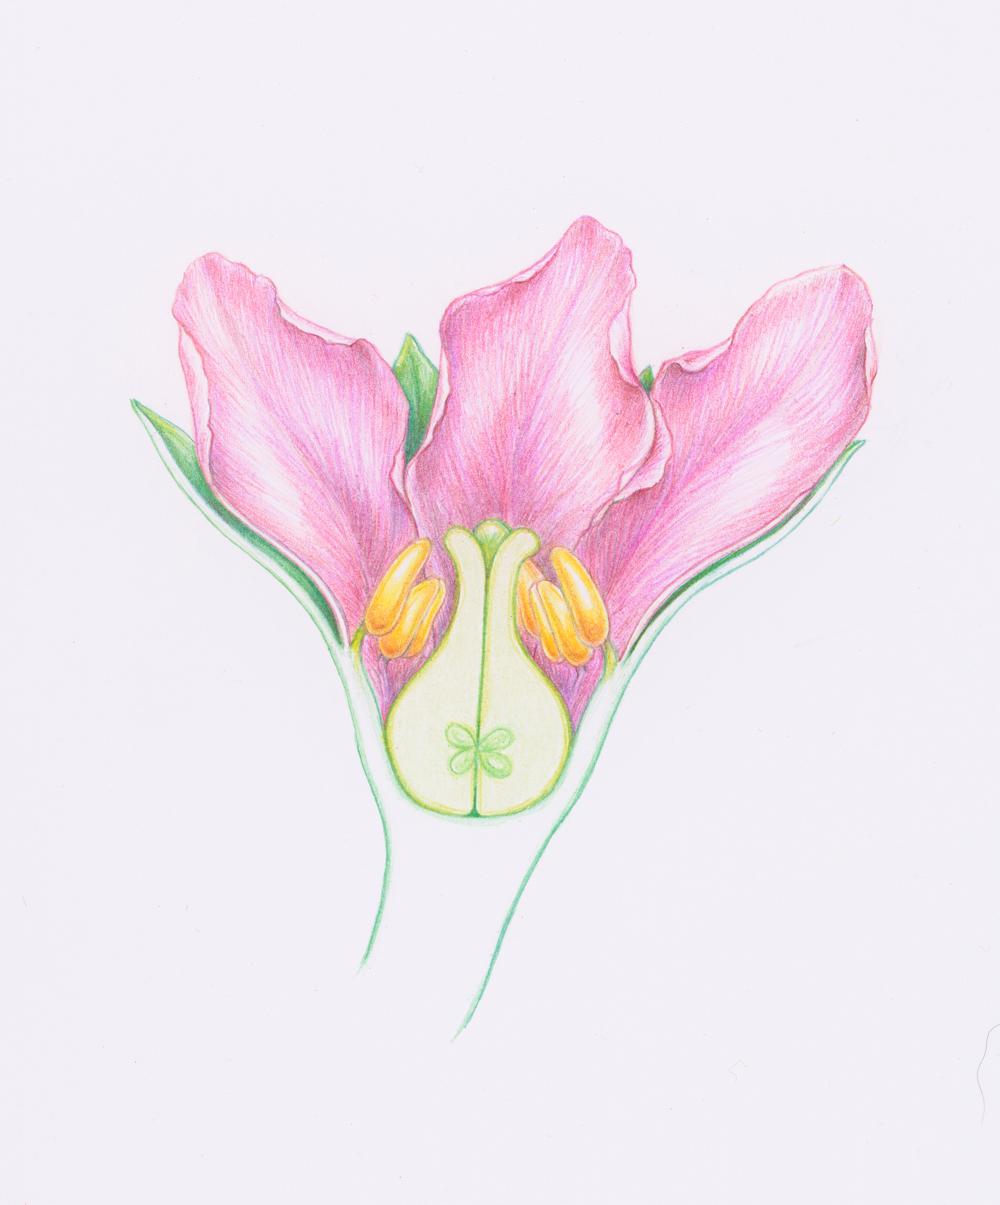 Caliciflora mauldinensis Reconstruction